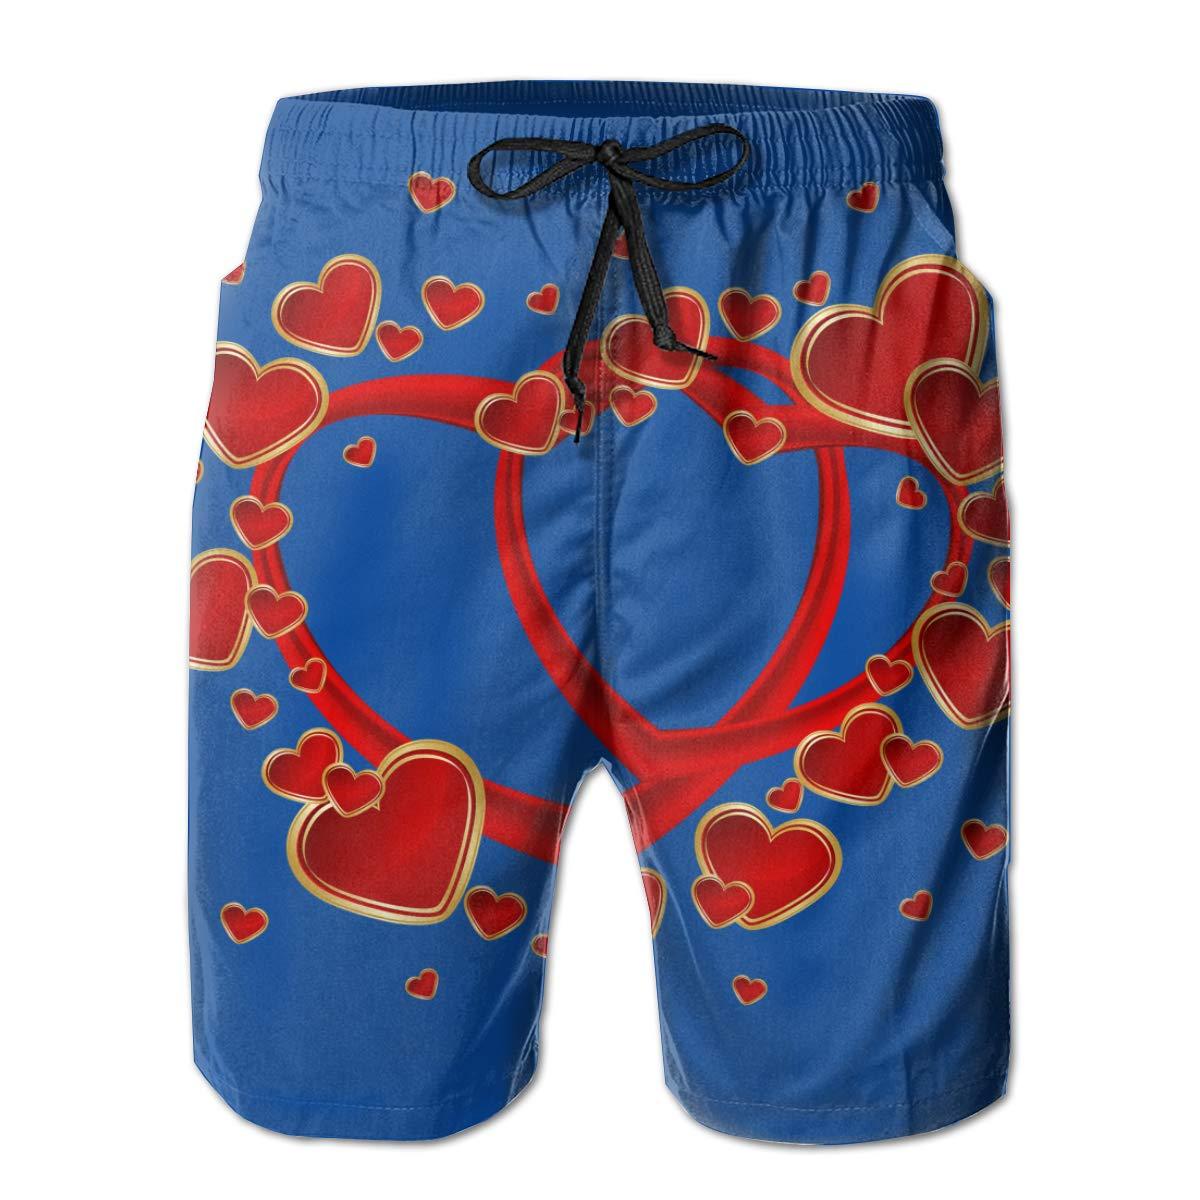 Mens Hawaiian Beach Shorts Printed Swim Pants Quick Dry Swimwear with Pockets /& Mesh Lining